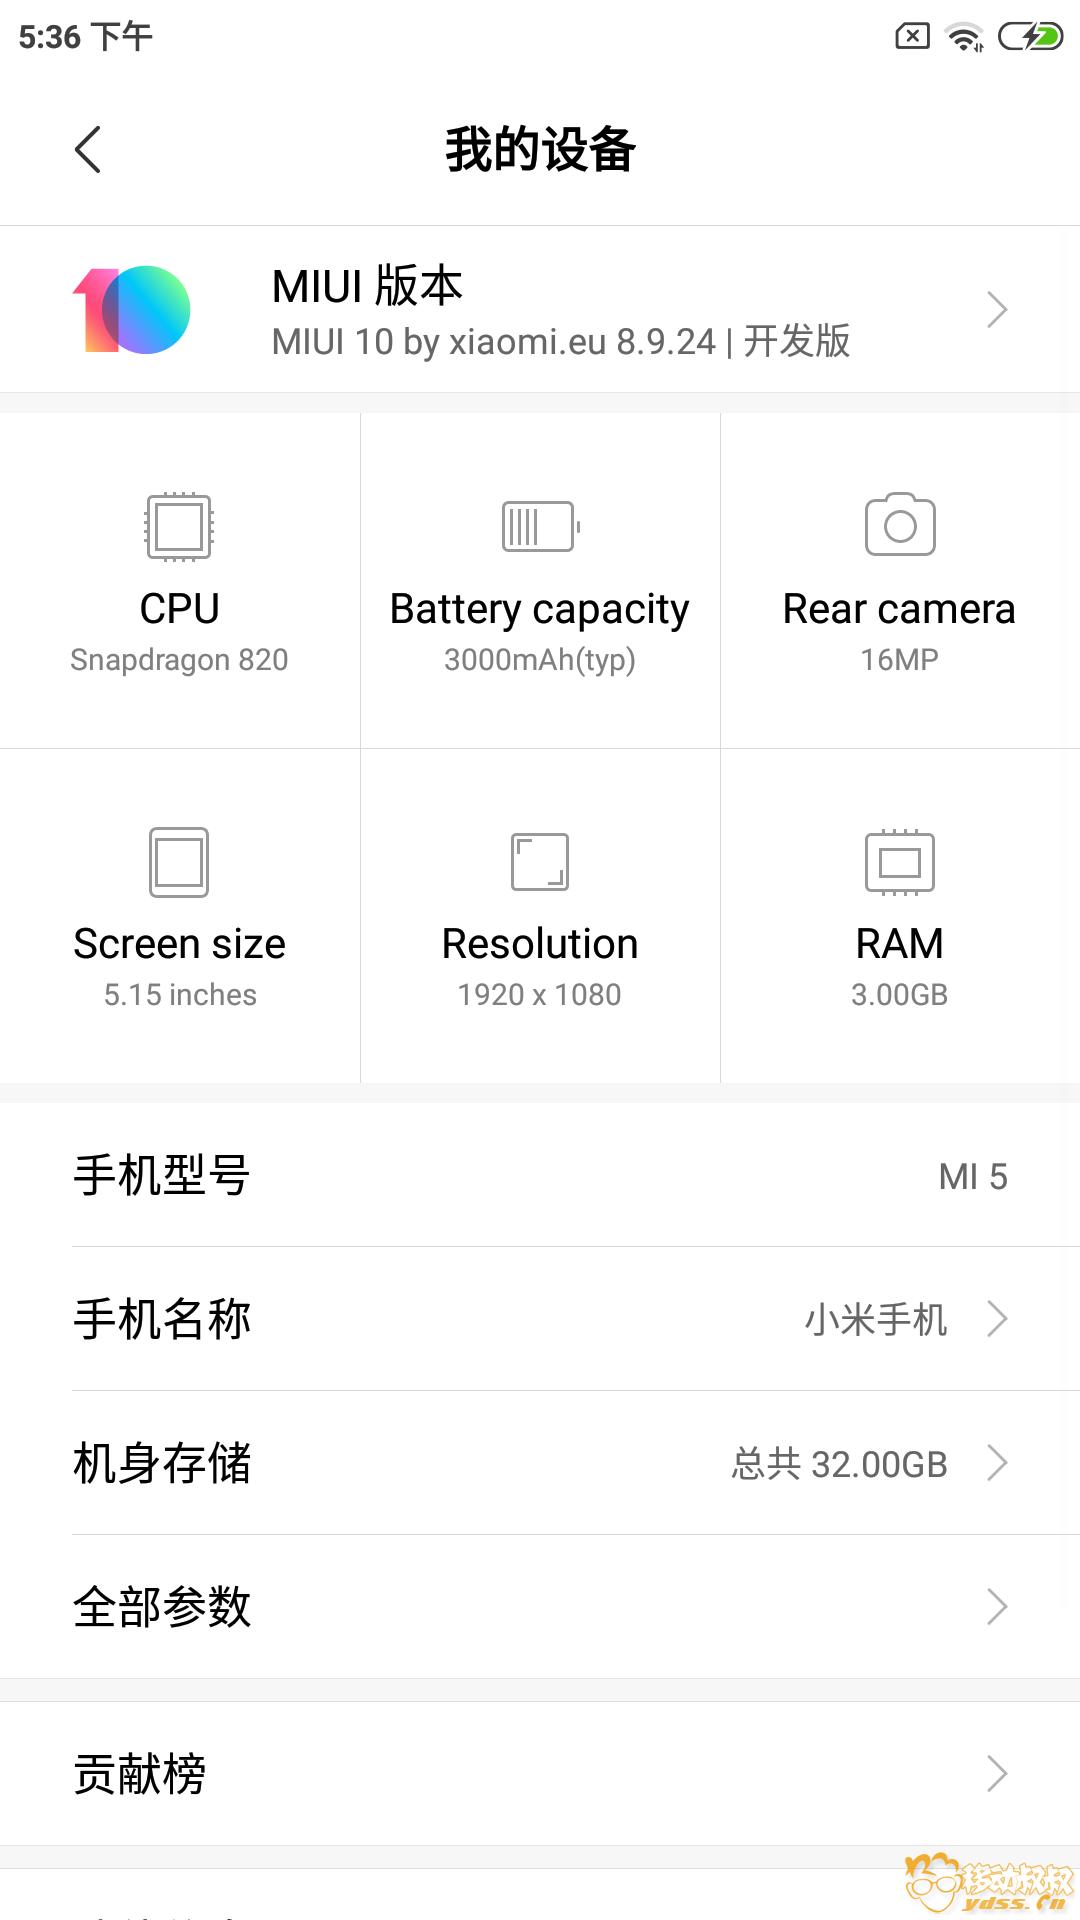 Screenshot_2018-09-24-17-36-39-381_com.android.settings.png